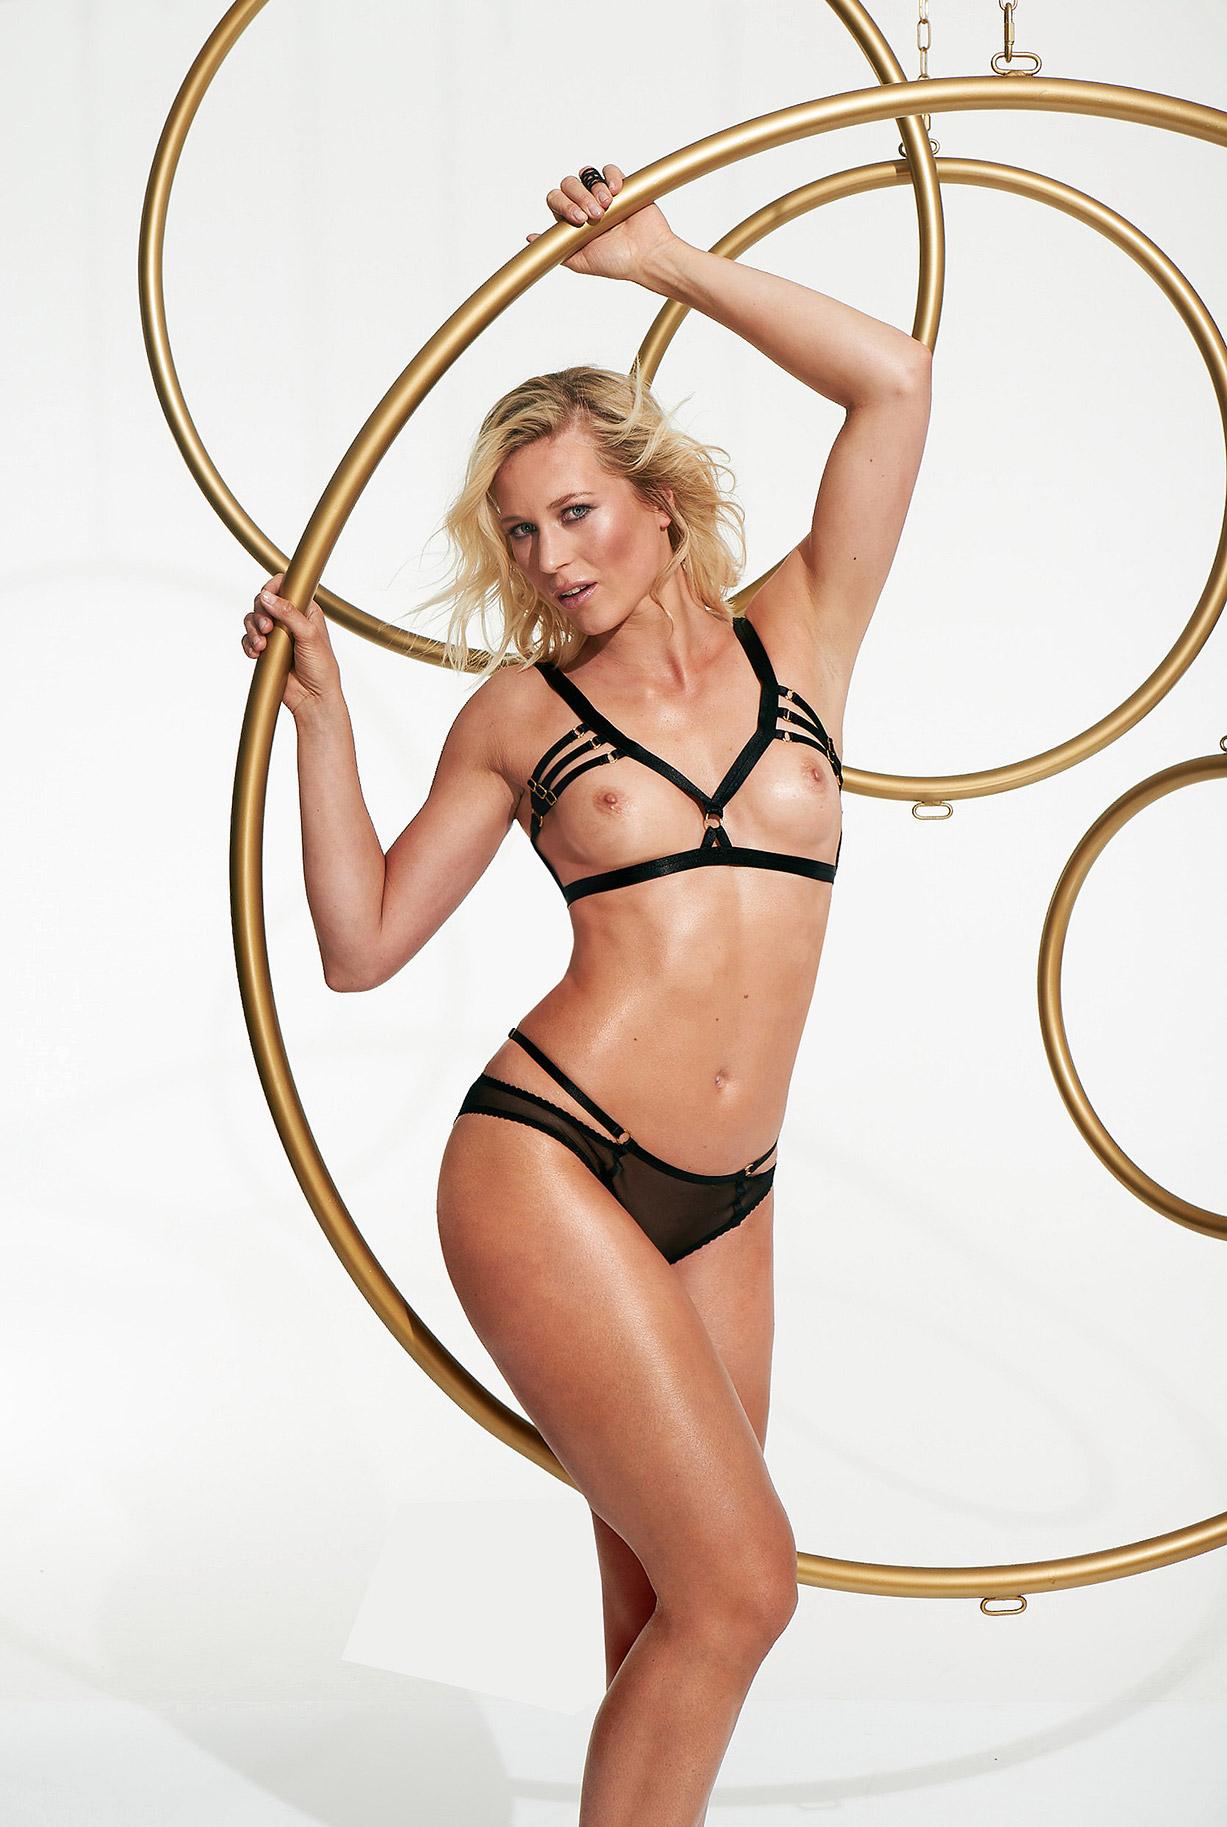 German-Nude-Olympic-Stars-for-Playboy-4.jpg